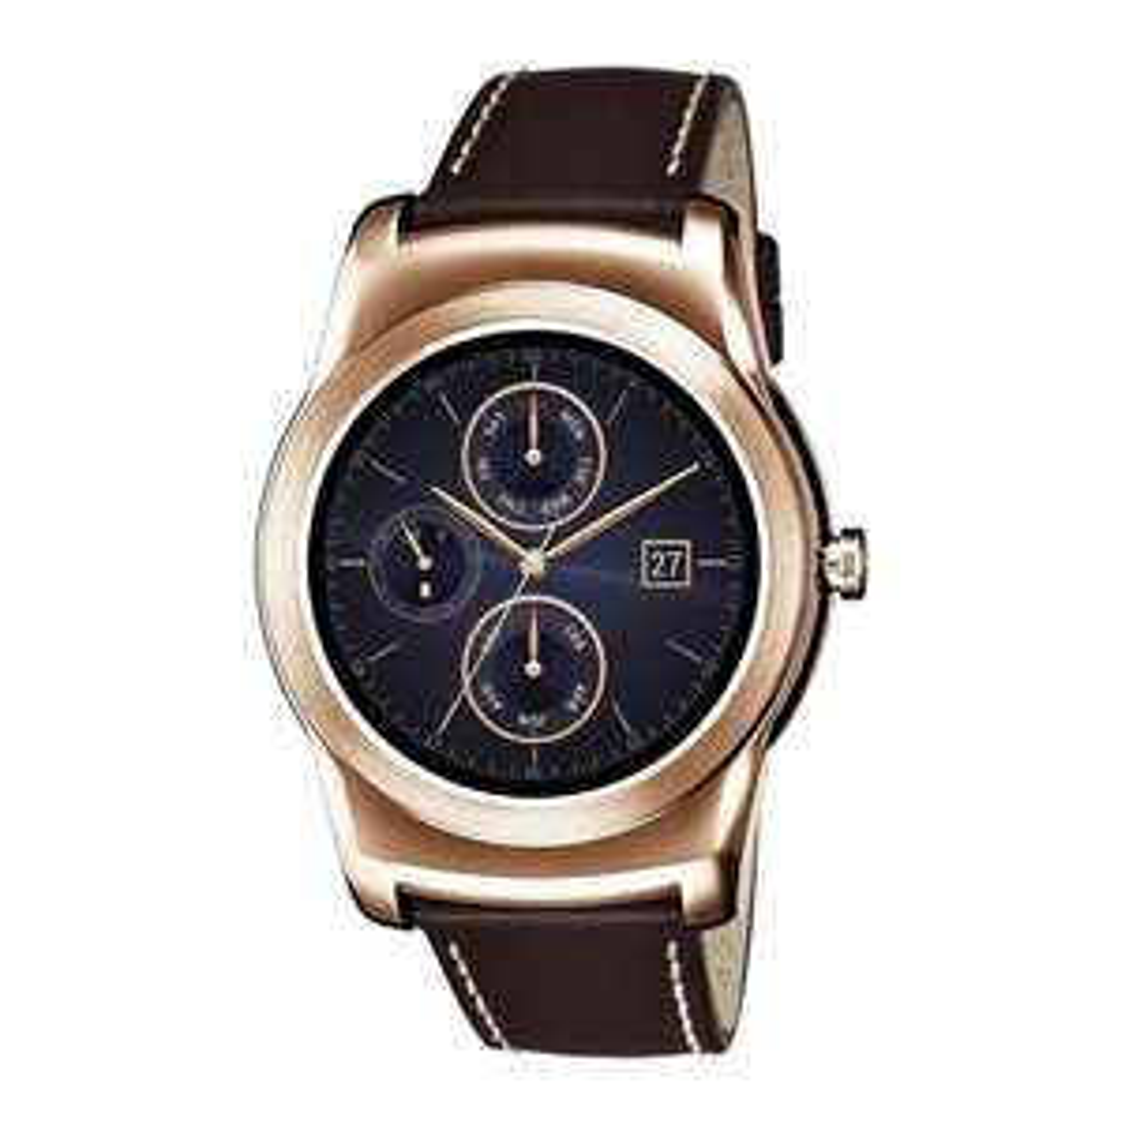 Sam's Club en línea: Smartwatch LG urbane piel dorado a $3,499